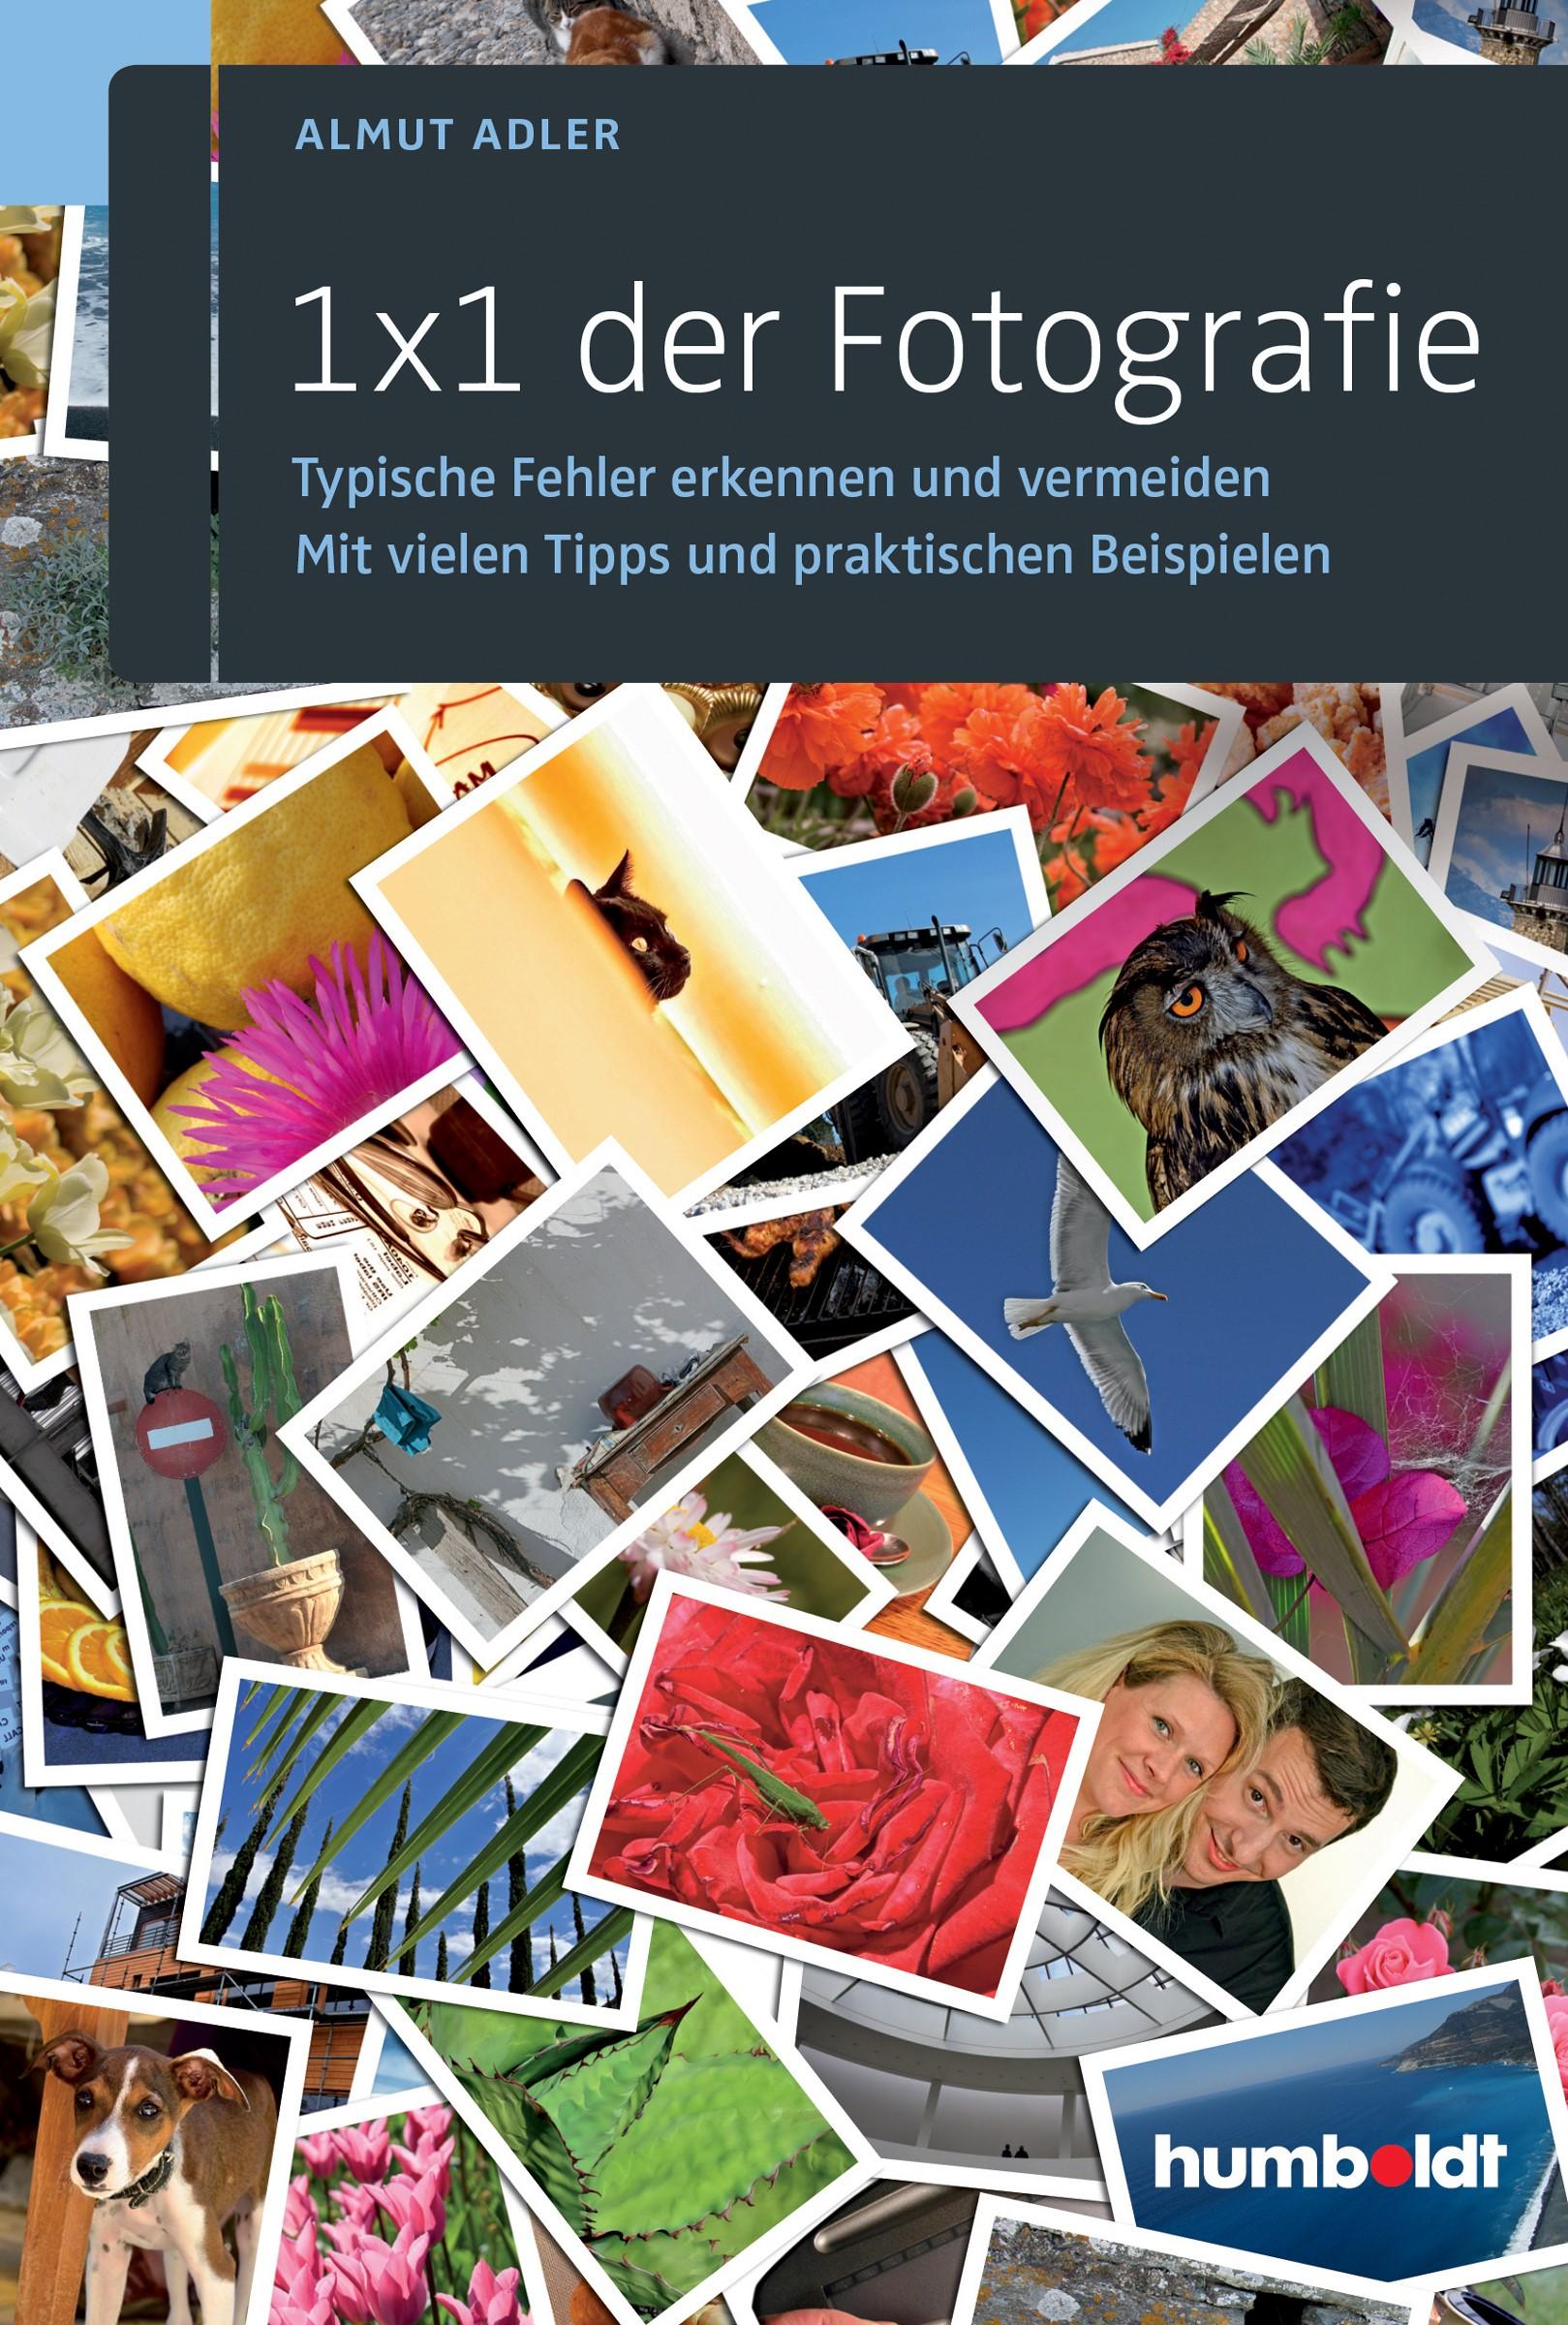 1 x 1 der Fotografie   Adler, 2015   Buch (Cover)